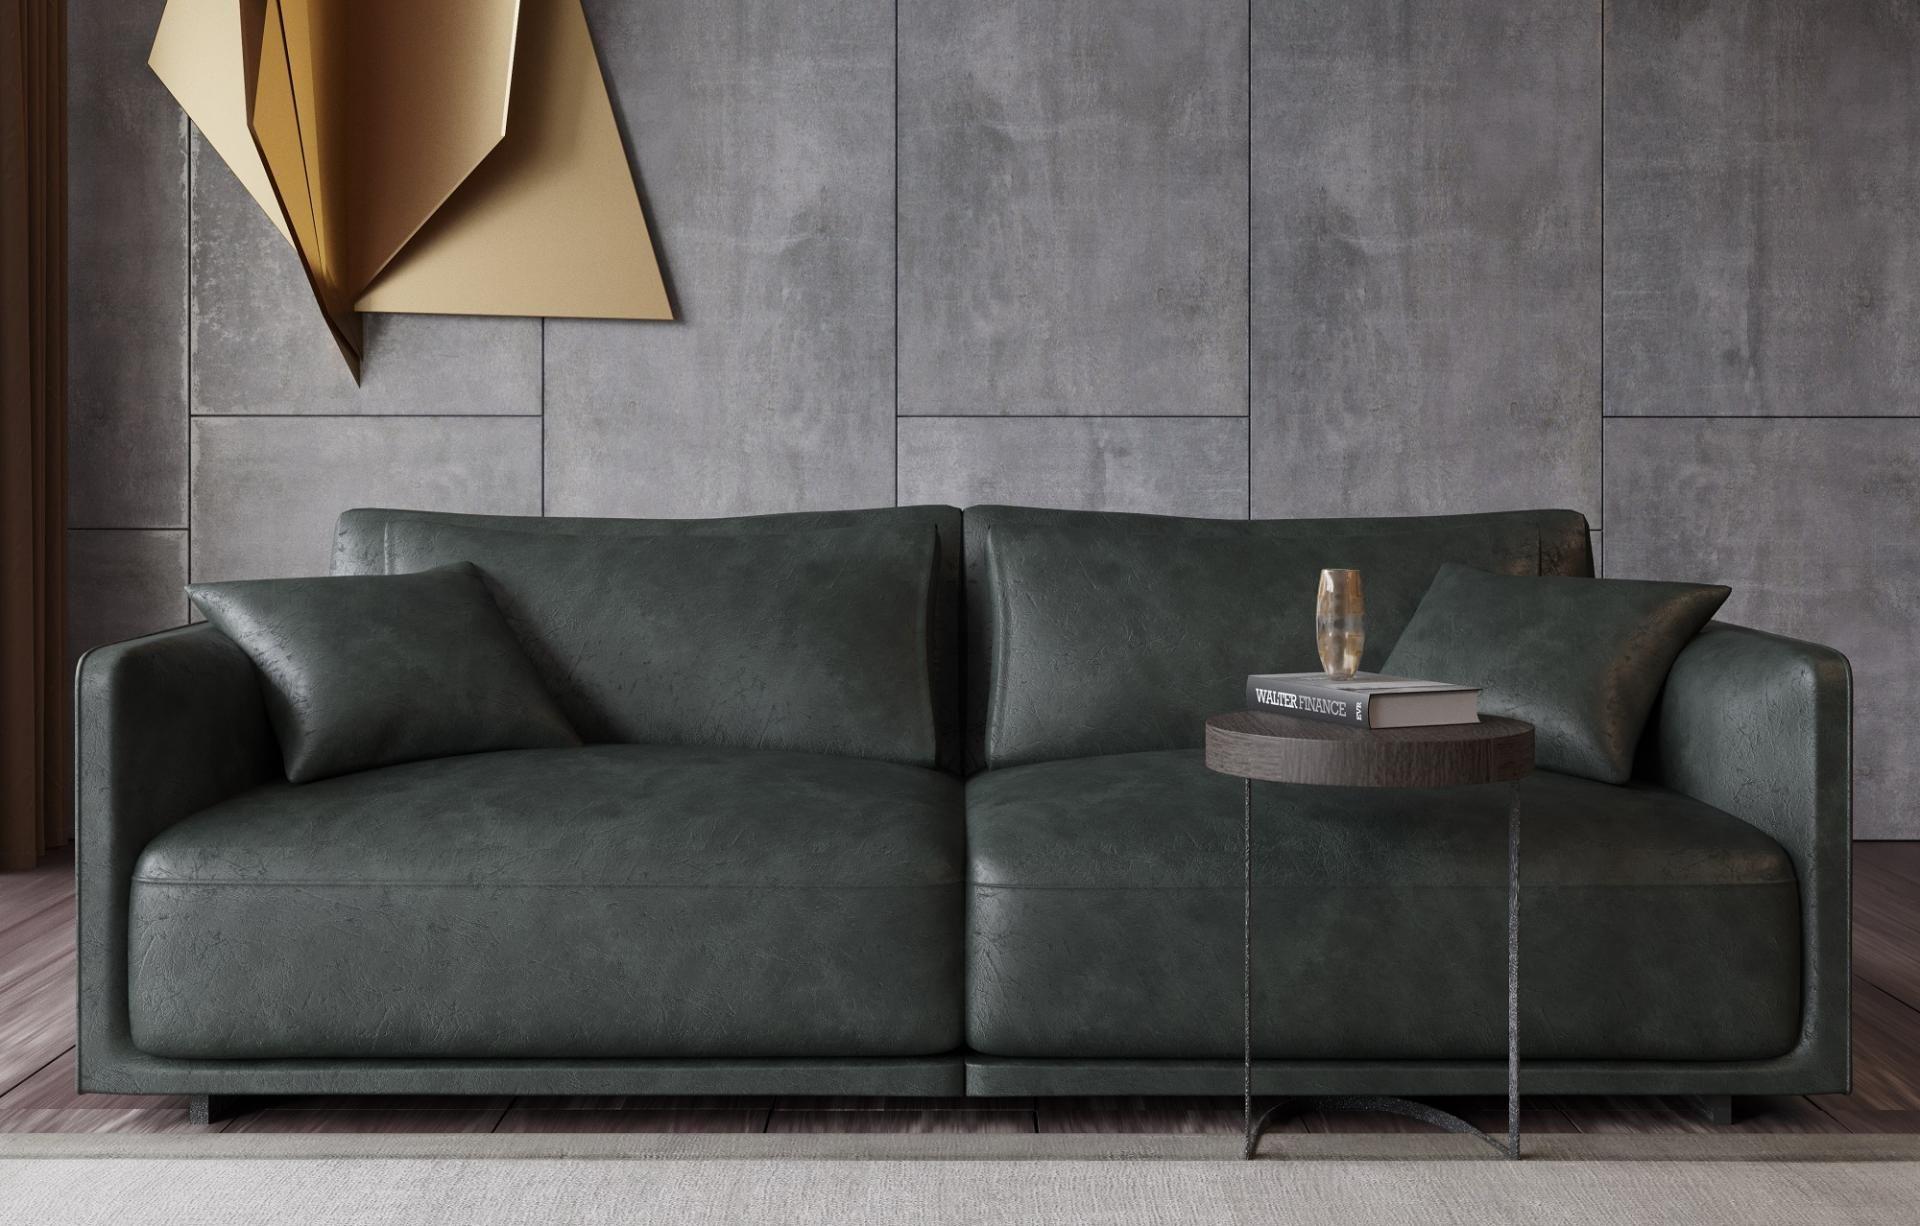 Sumela Koltuk Takimi Mobilya Koltuklar Furniture